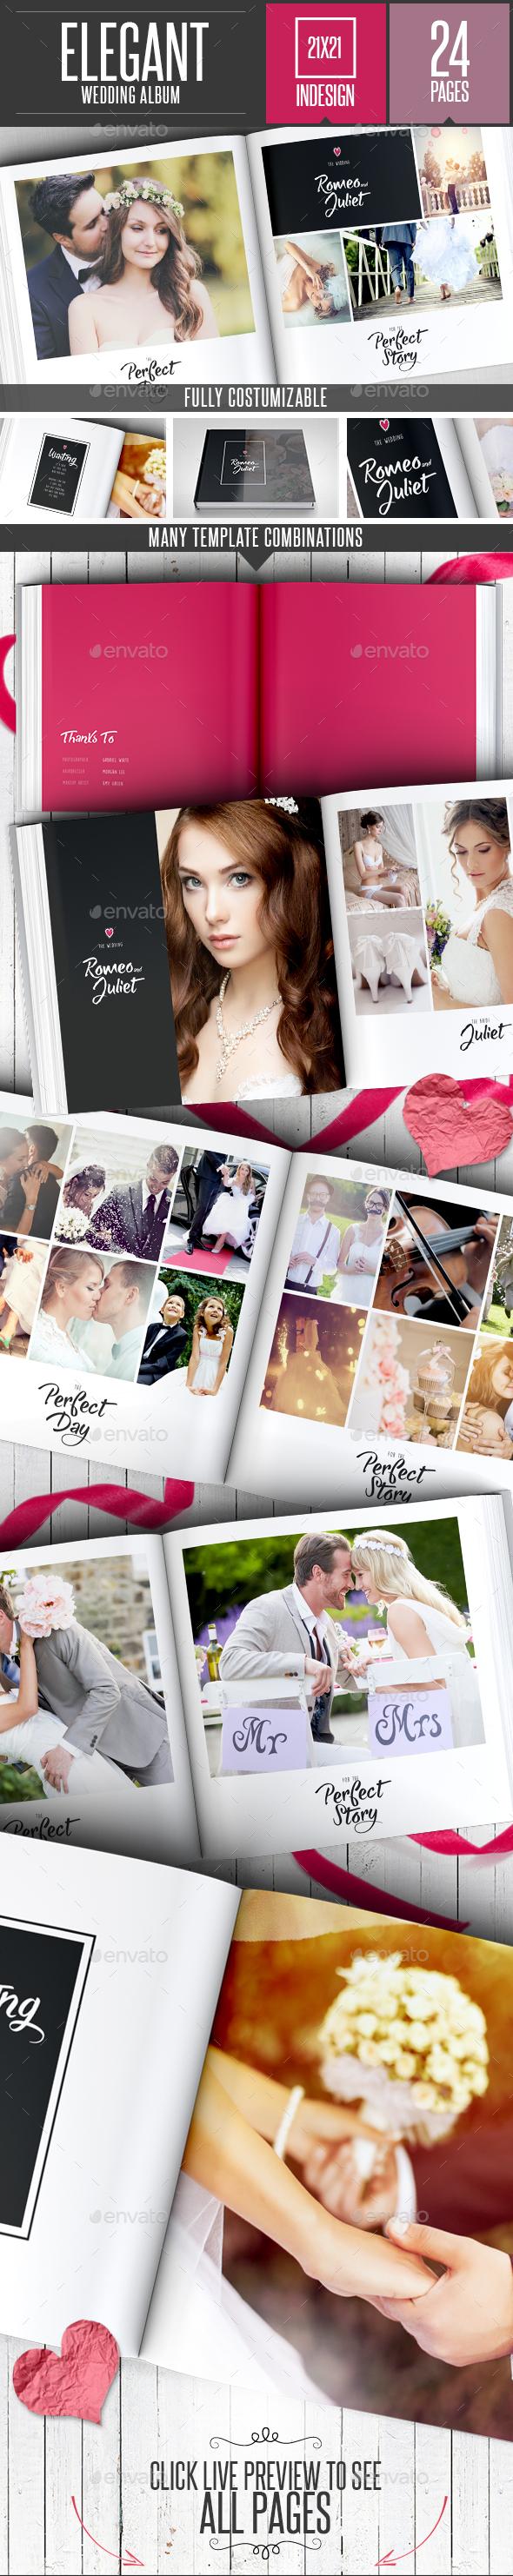 Elegant Wedding Square Photo Album Template - Photo Albums Print Templates